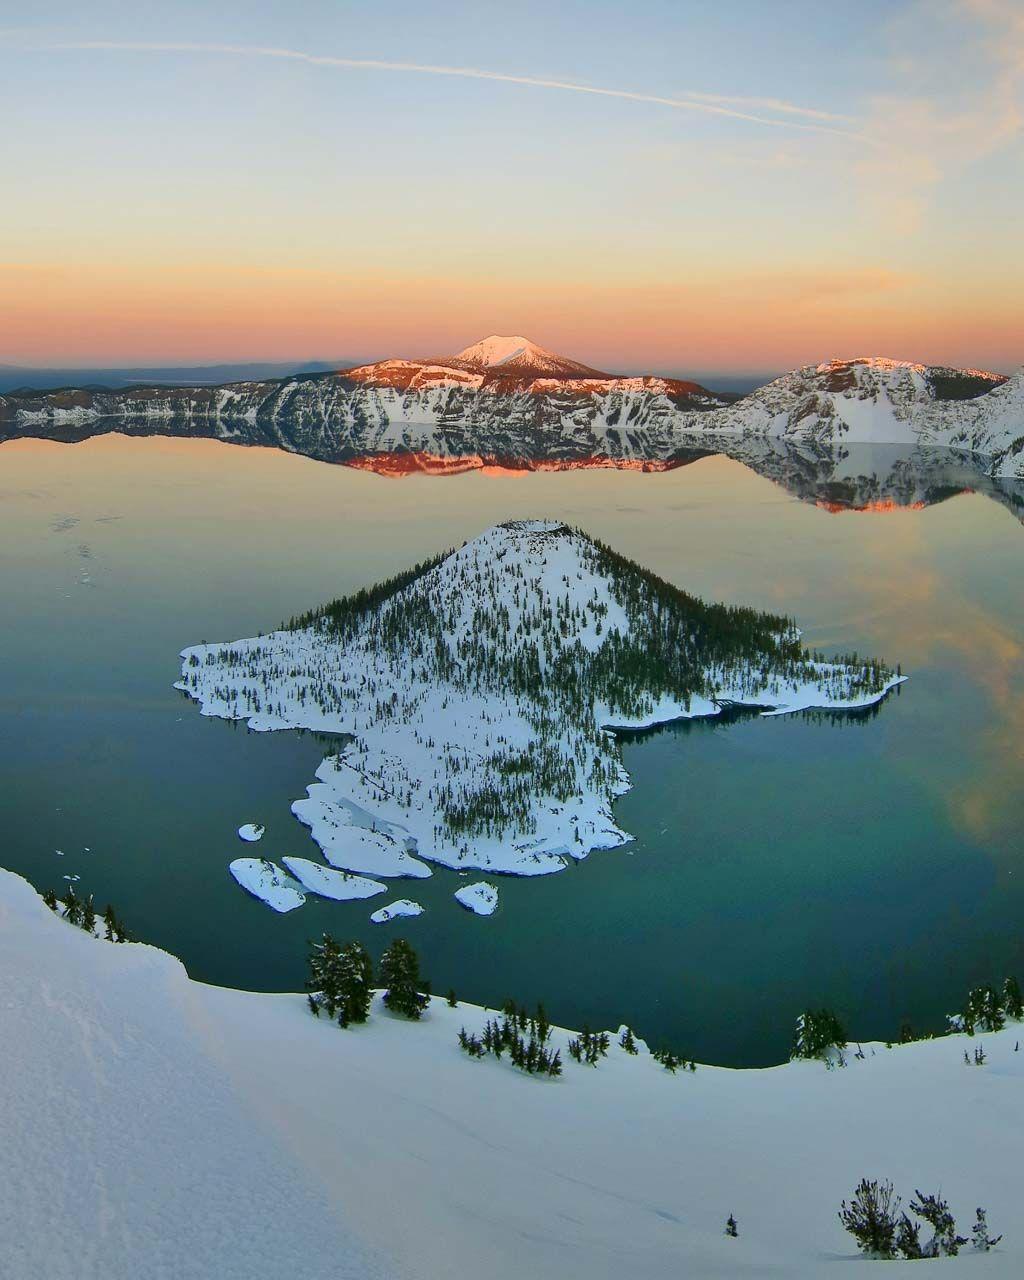 Winter at Crater Lake National Park